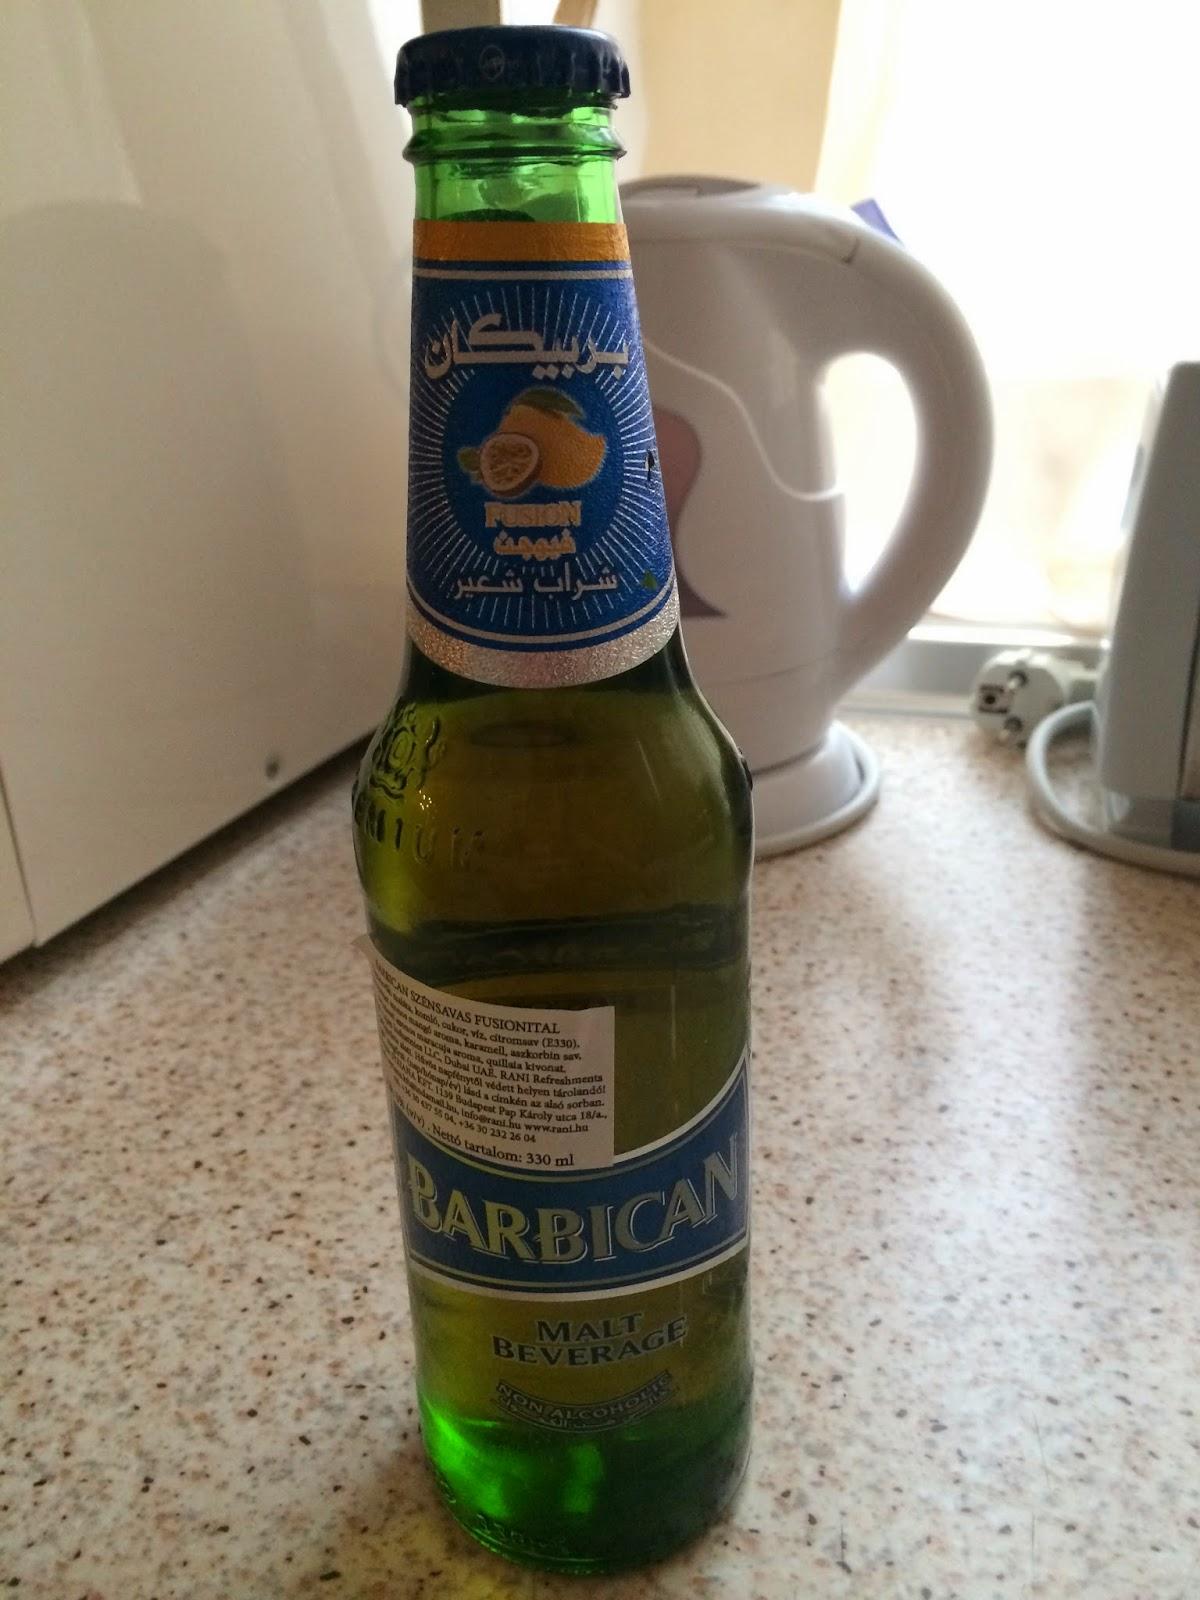 World Beer Experience: Barbican lemon - U A E  - 21-1-2014